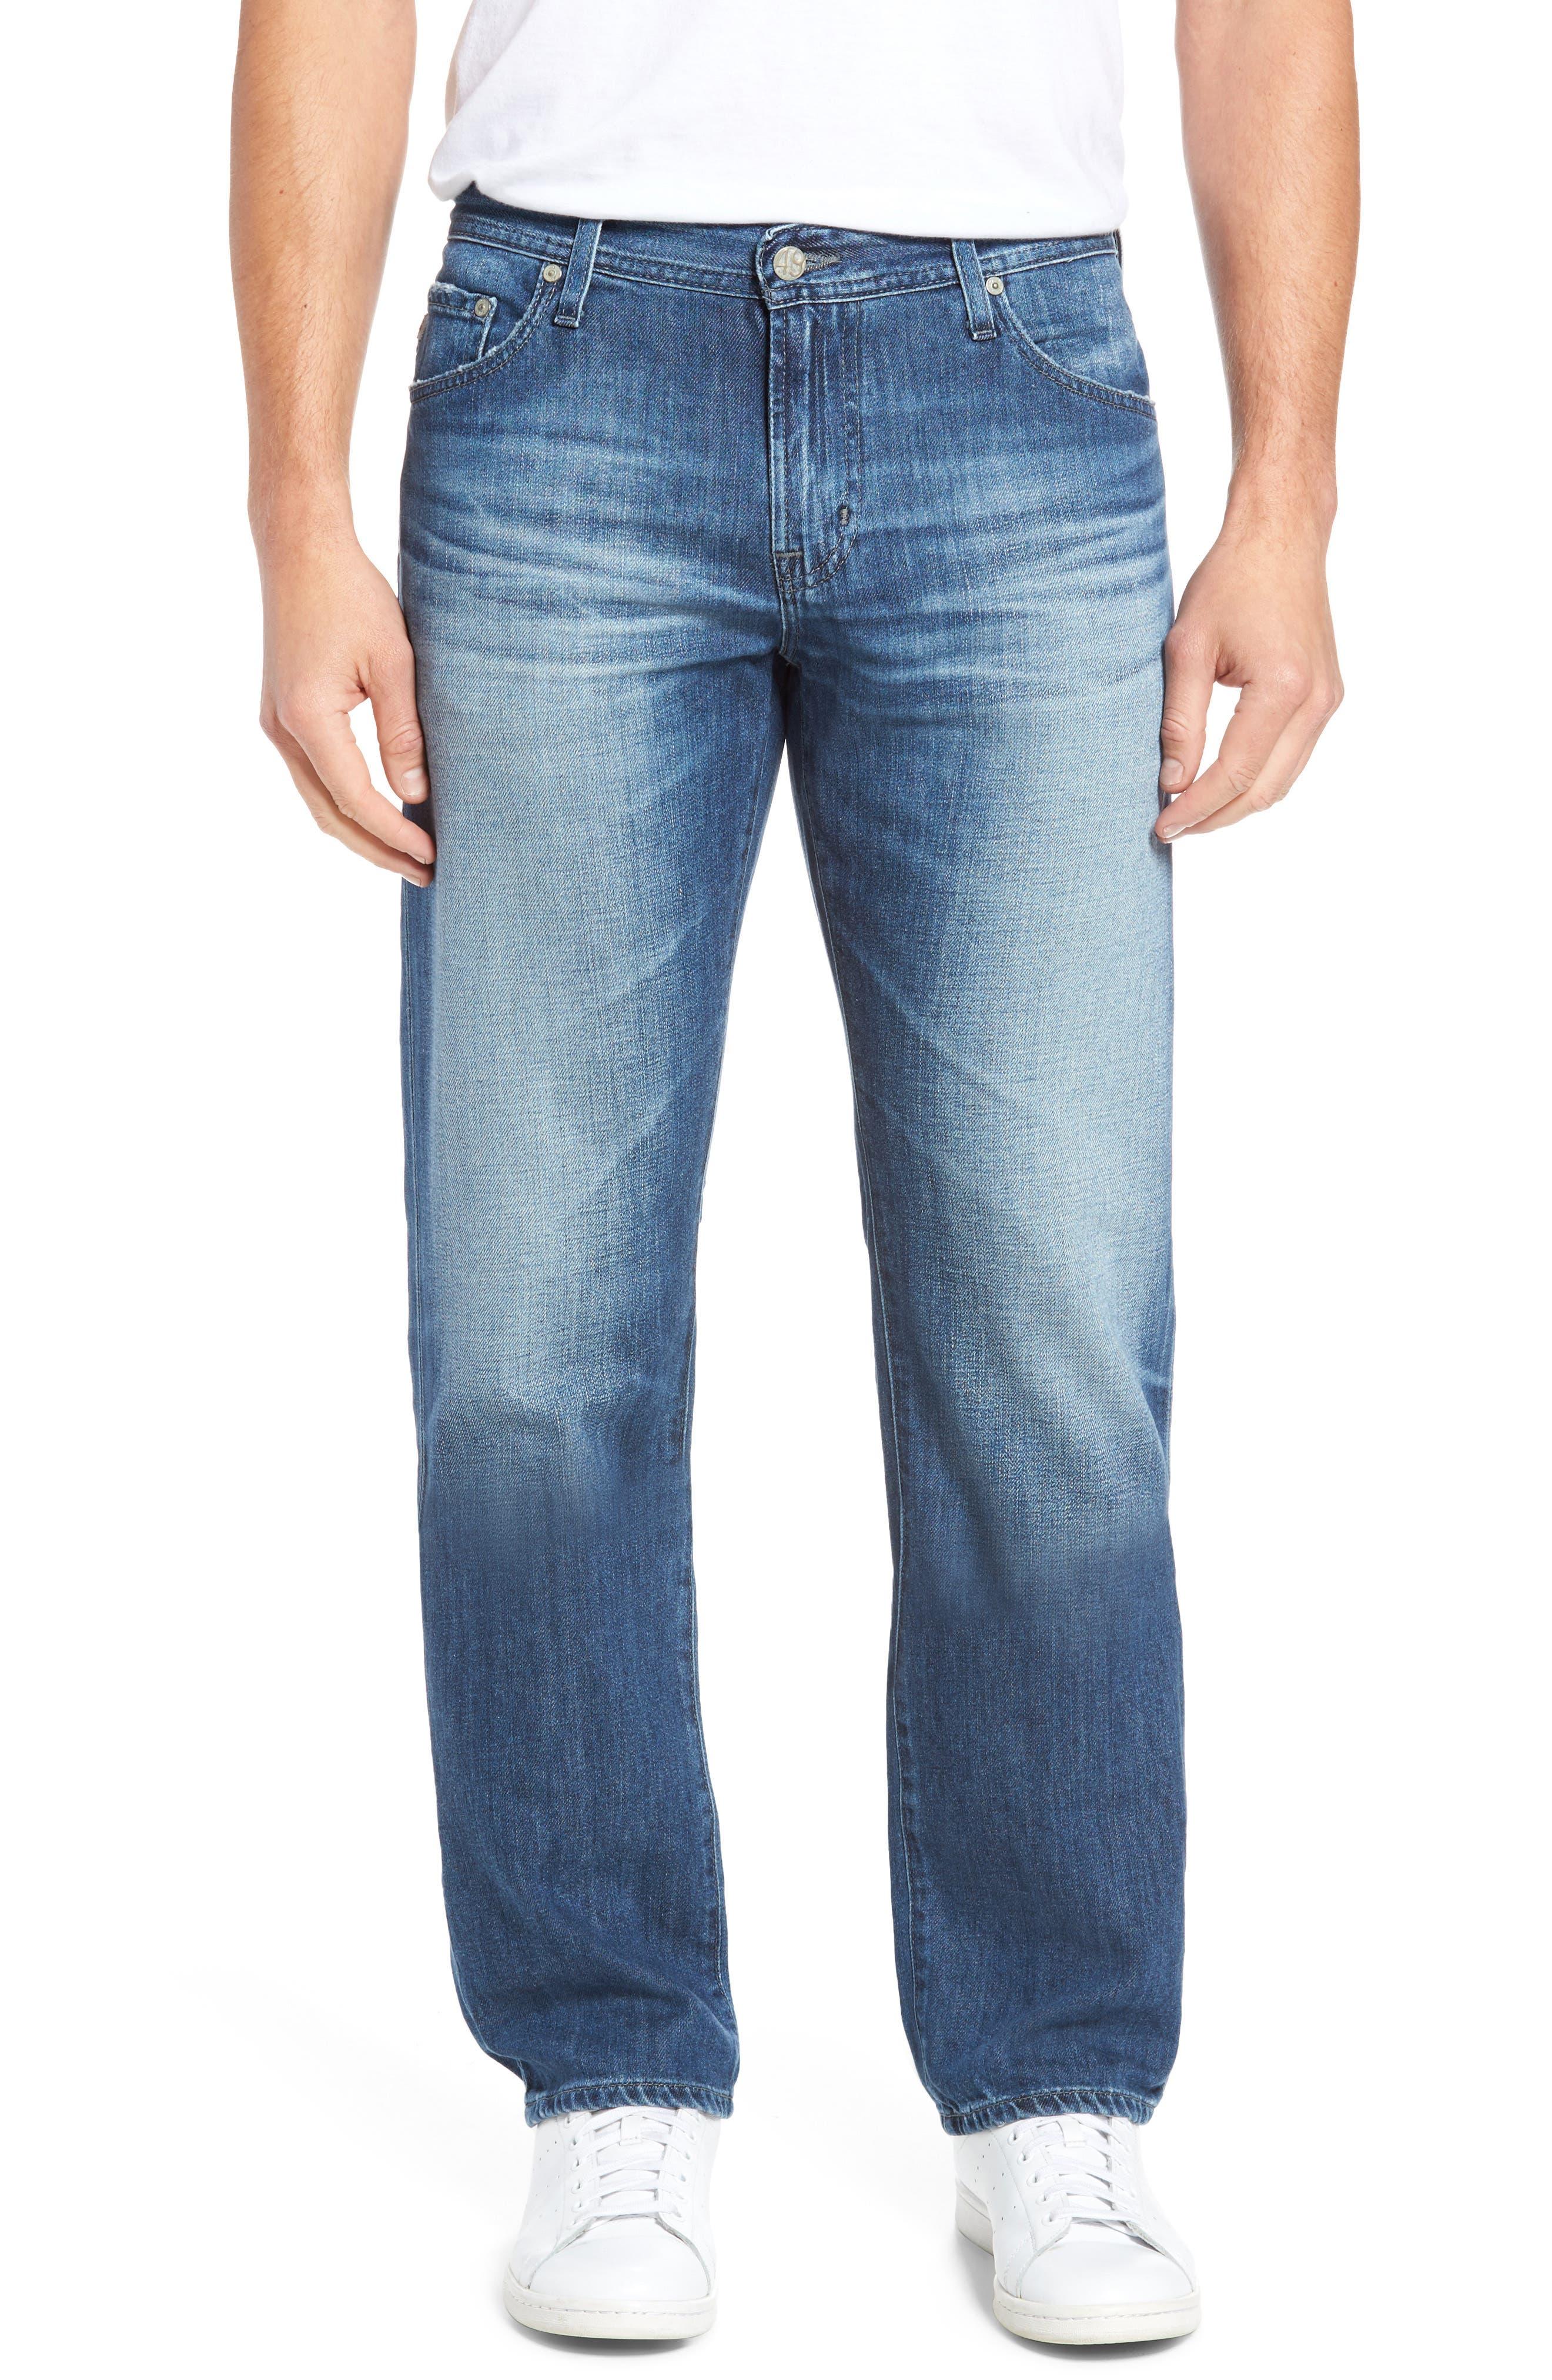 Graduate Slim Straight Fit Jeans,                             Main thumbnail 1, color,